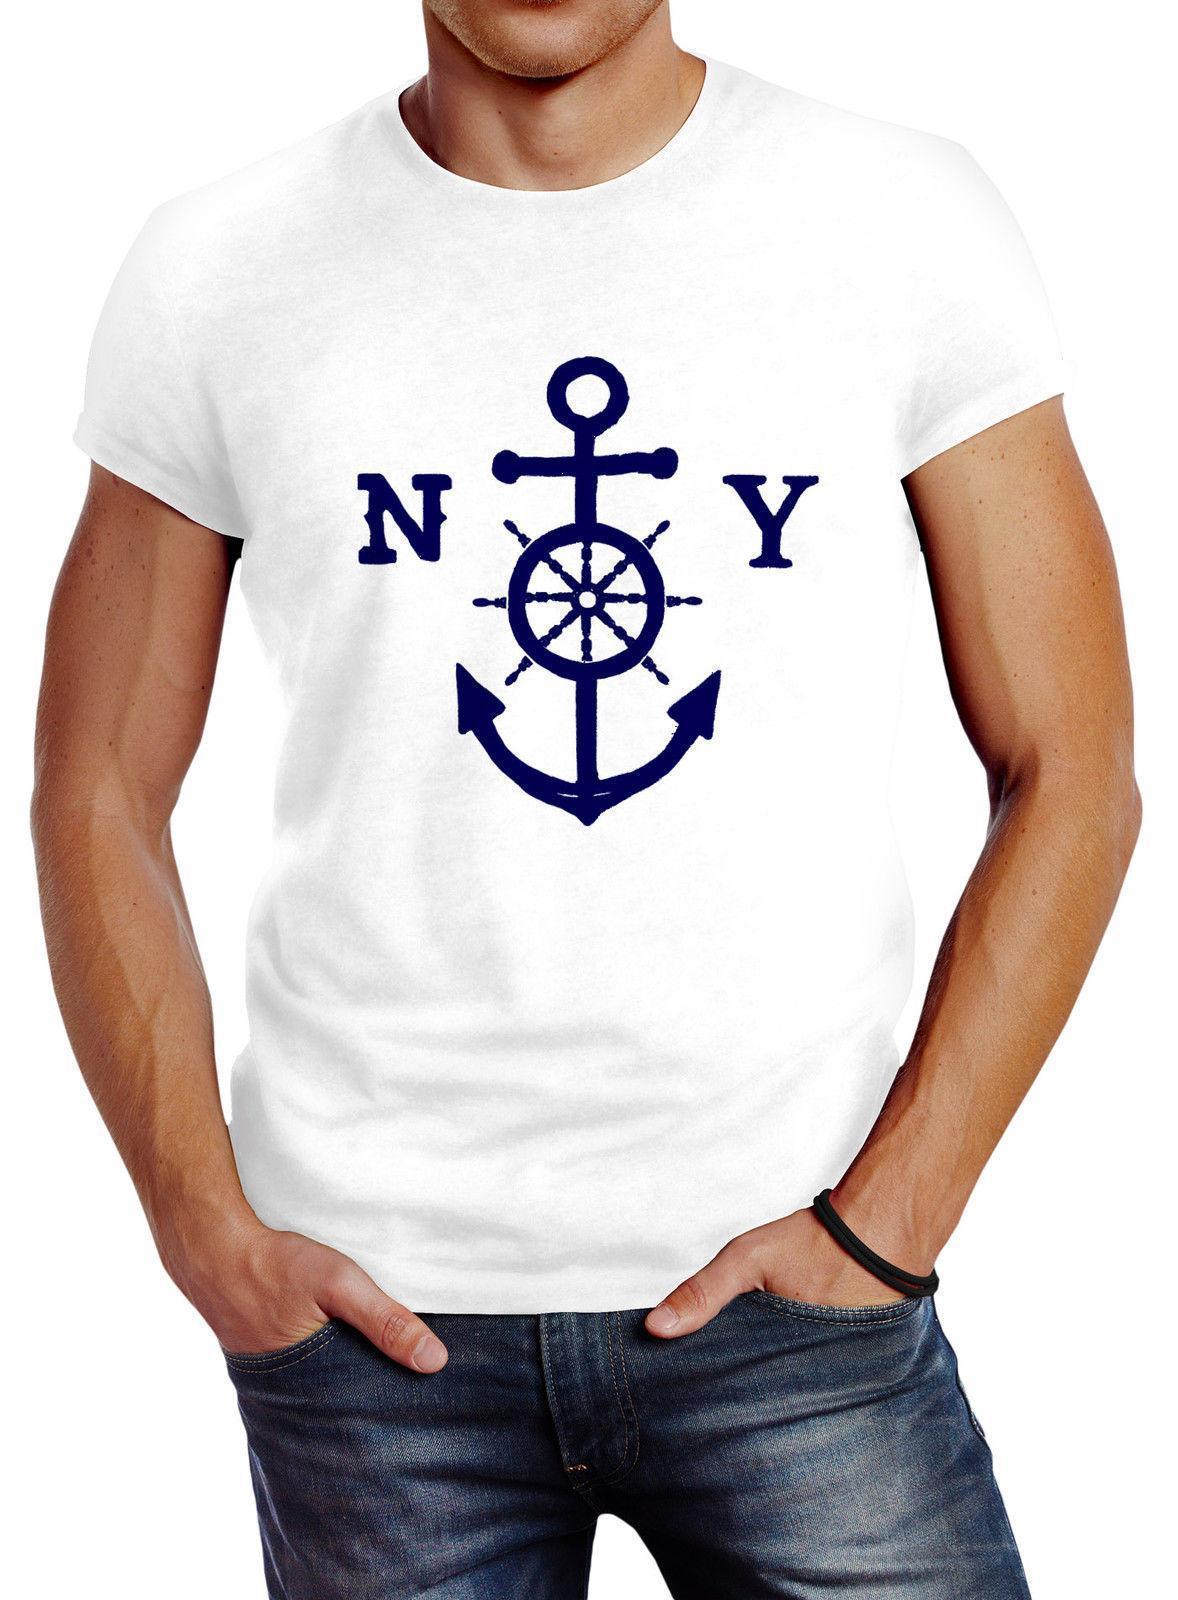 ecfcab41cca5ea Herren T Shirt Anker Steuerrad Anchor Steering Wheel Slim Fit Neverless T  Shirt Humor T Shirt With Shirt From Jie68